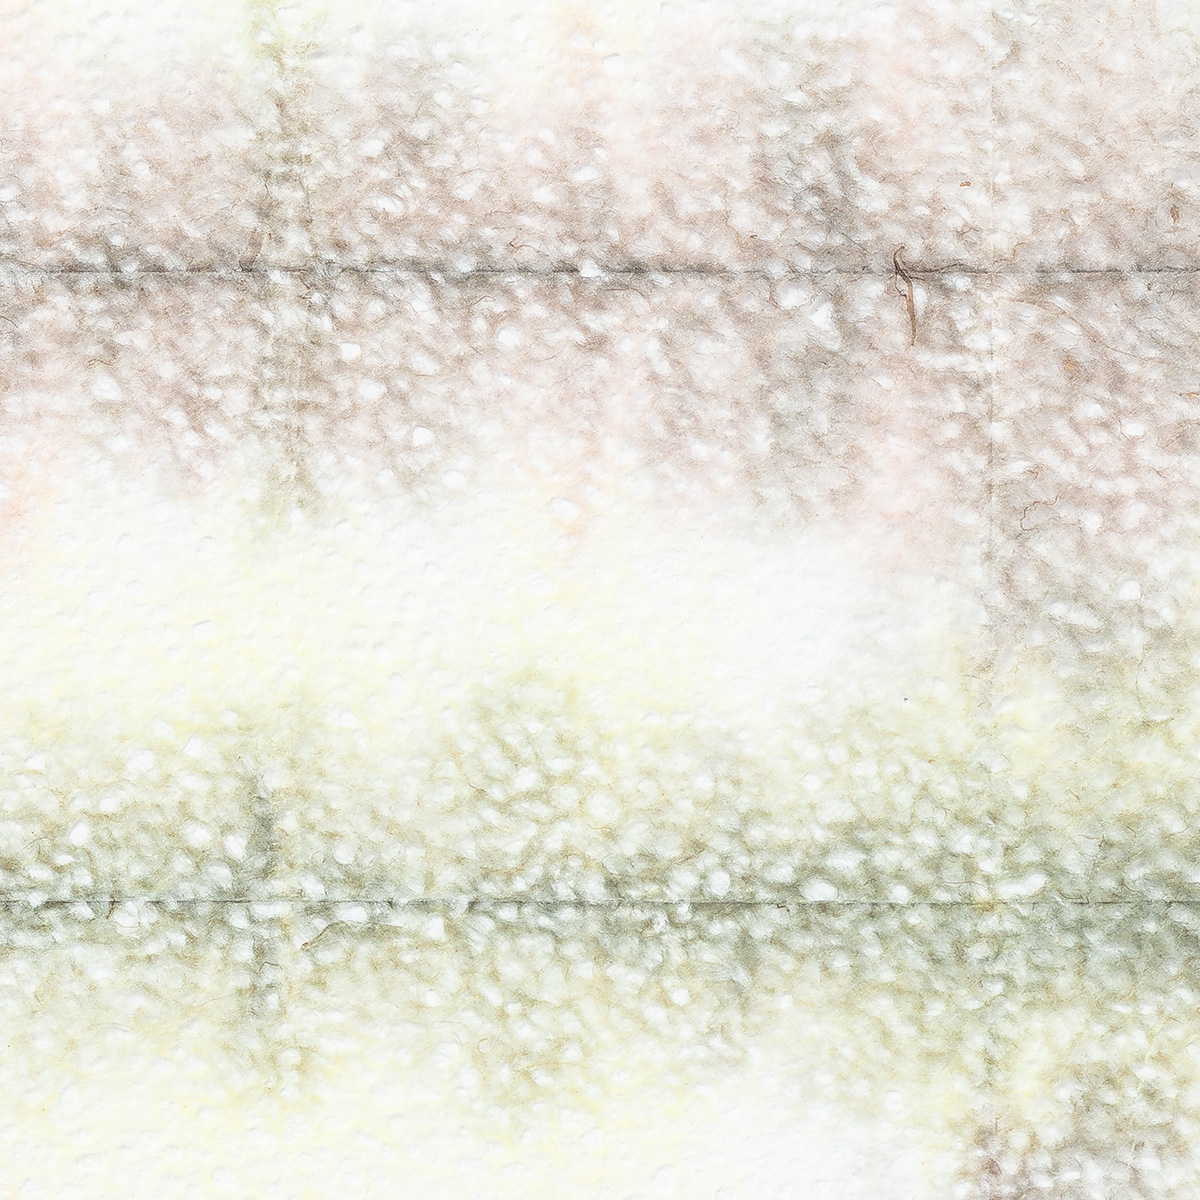 落水紙(春雨)板締め No.9